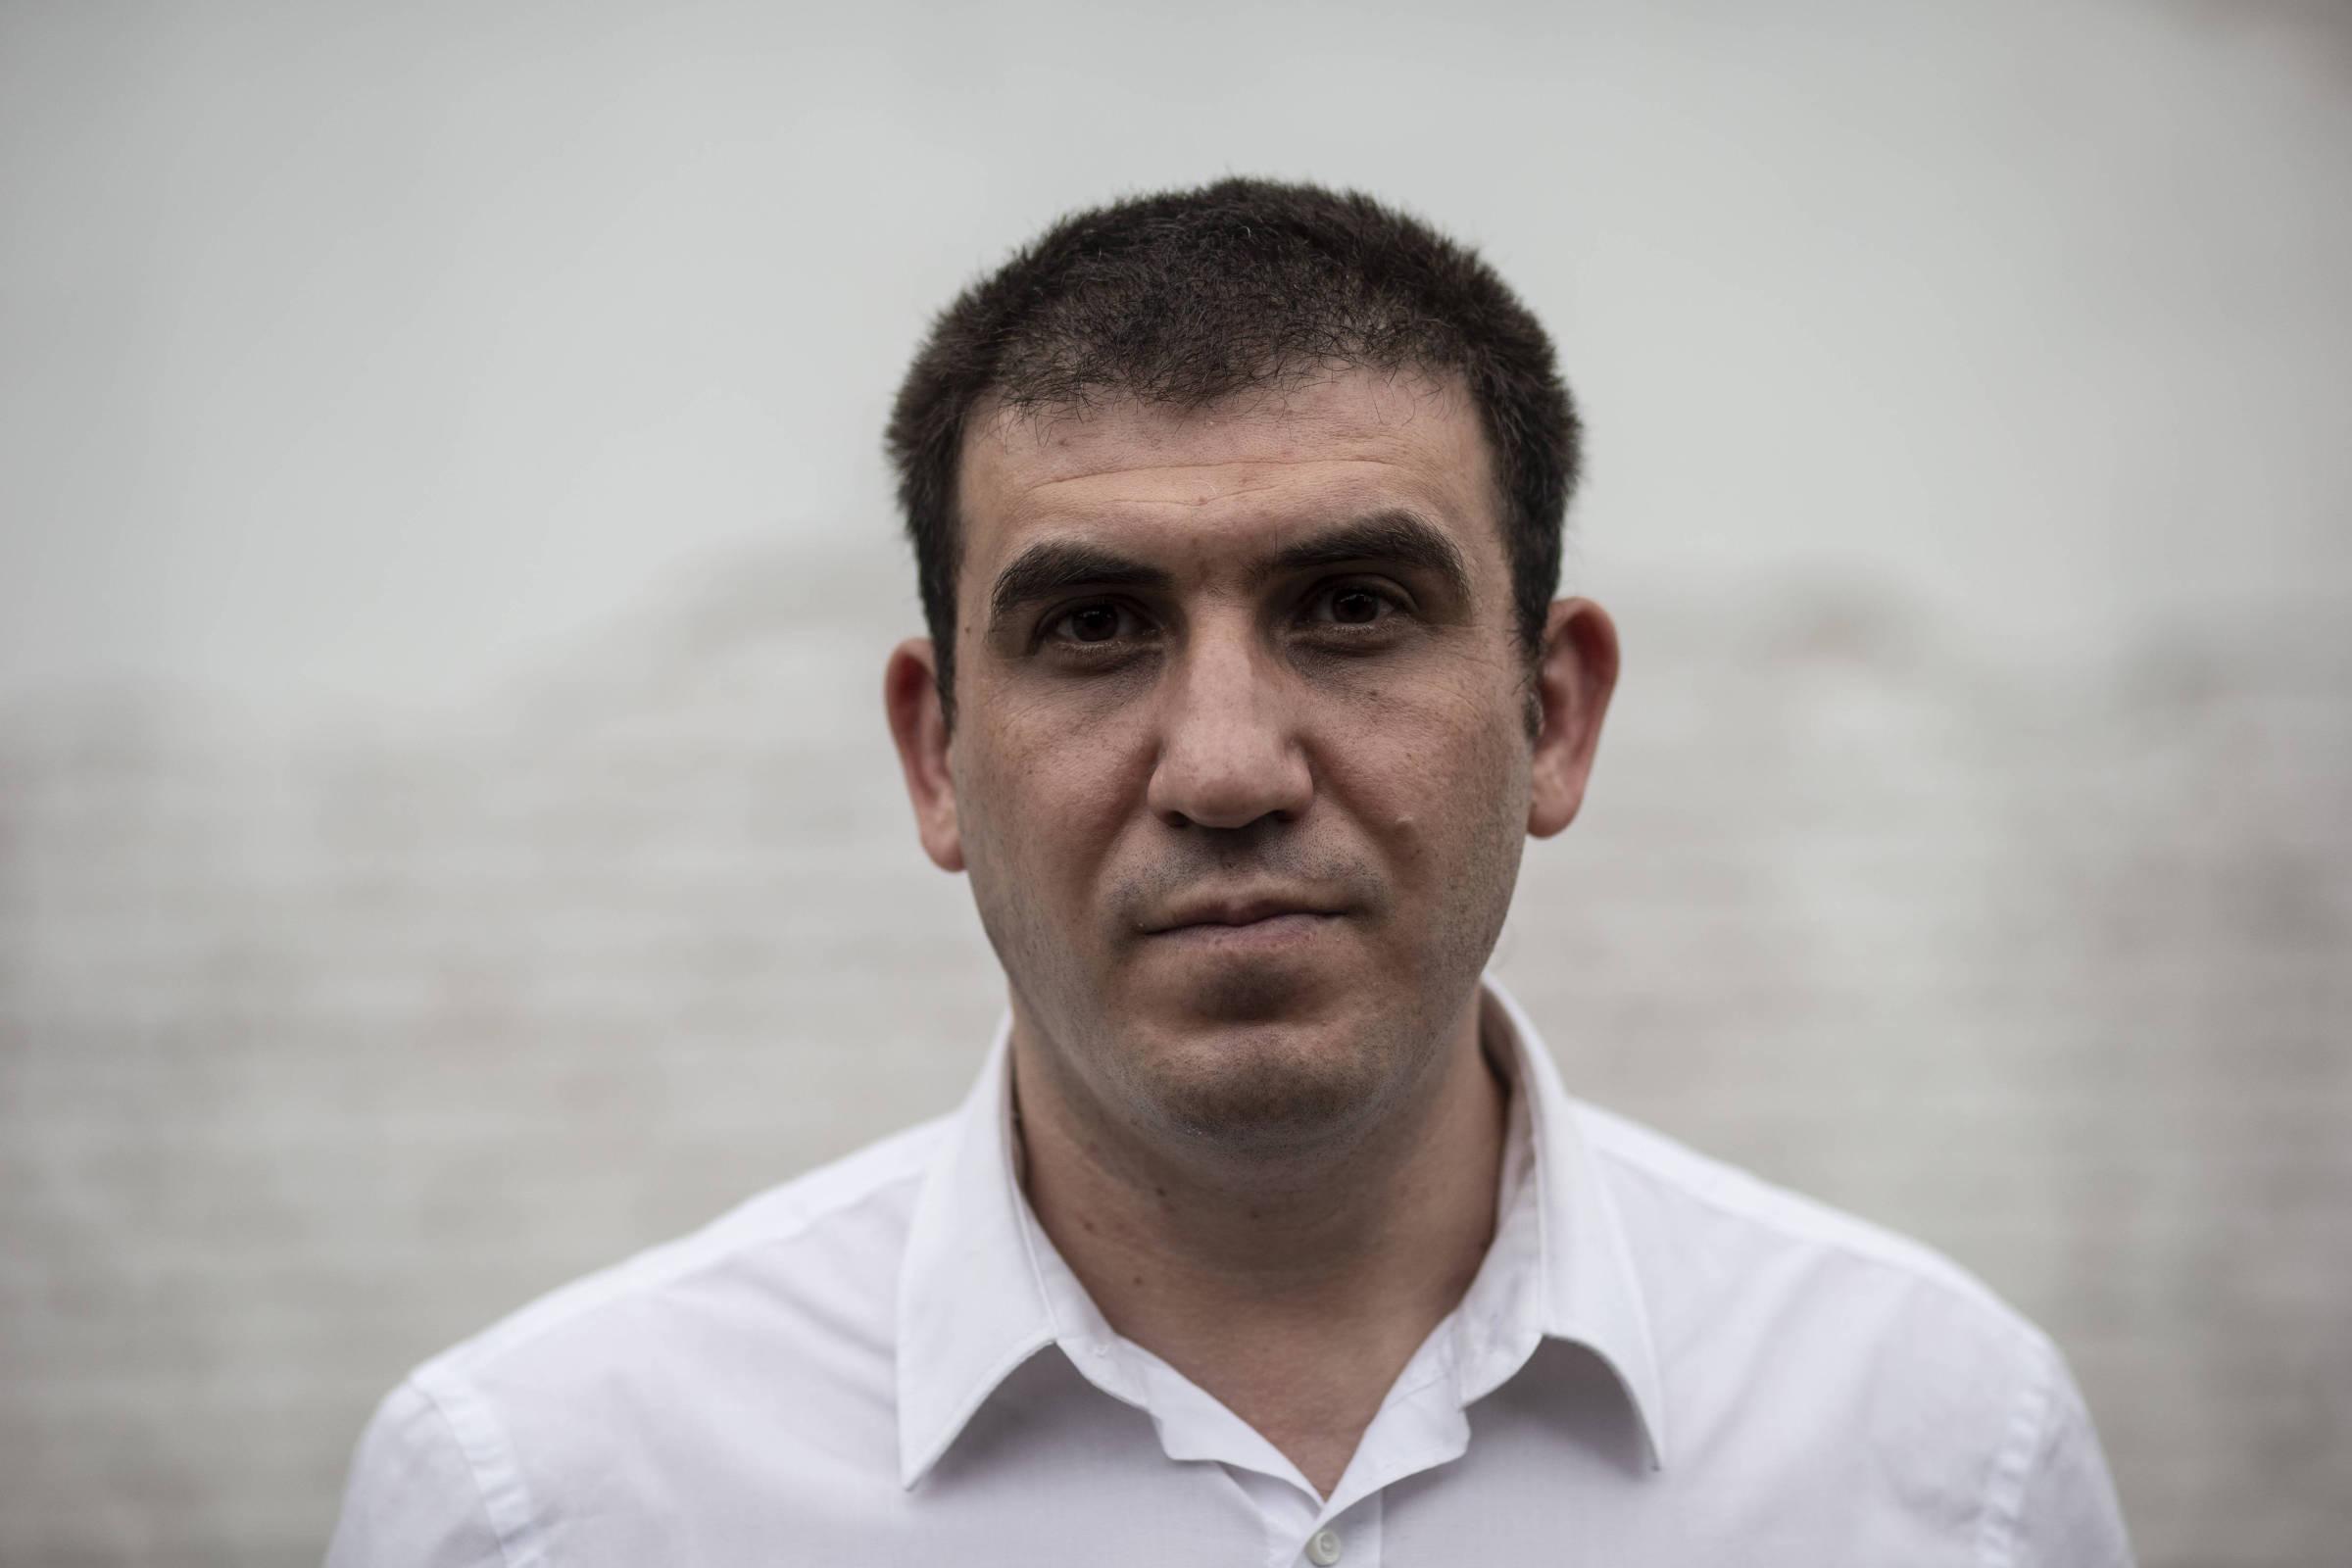 O jornalista Kamil Ergin, que escrevia sobre América Latina para o jornal turco Zaman